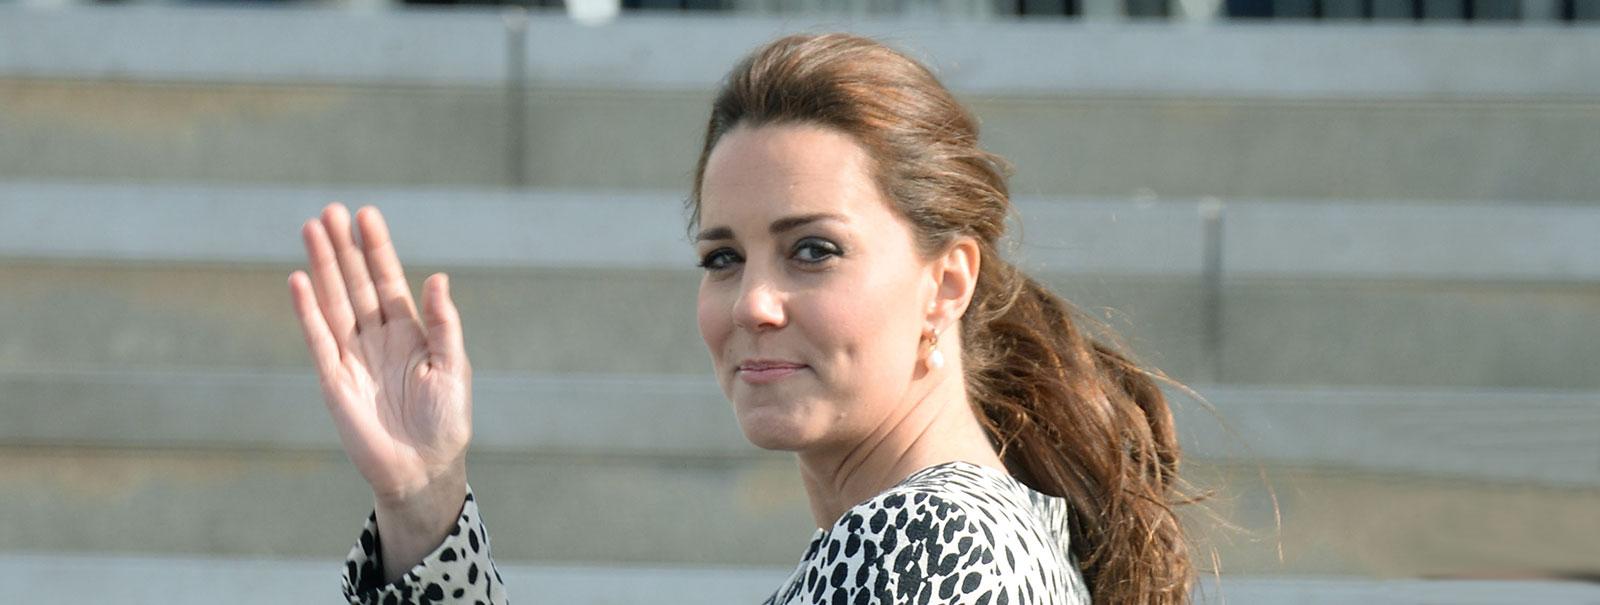 10 cose da sapere su... Kate Middleton